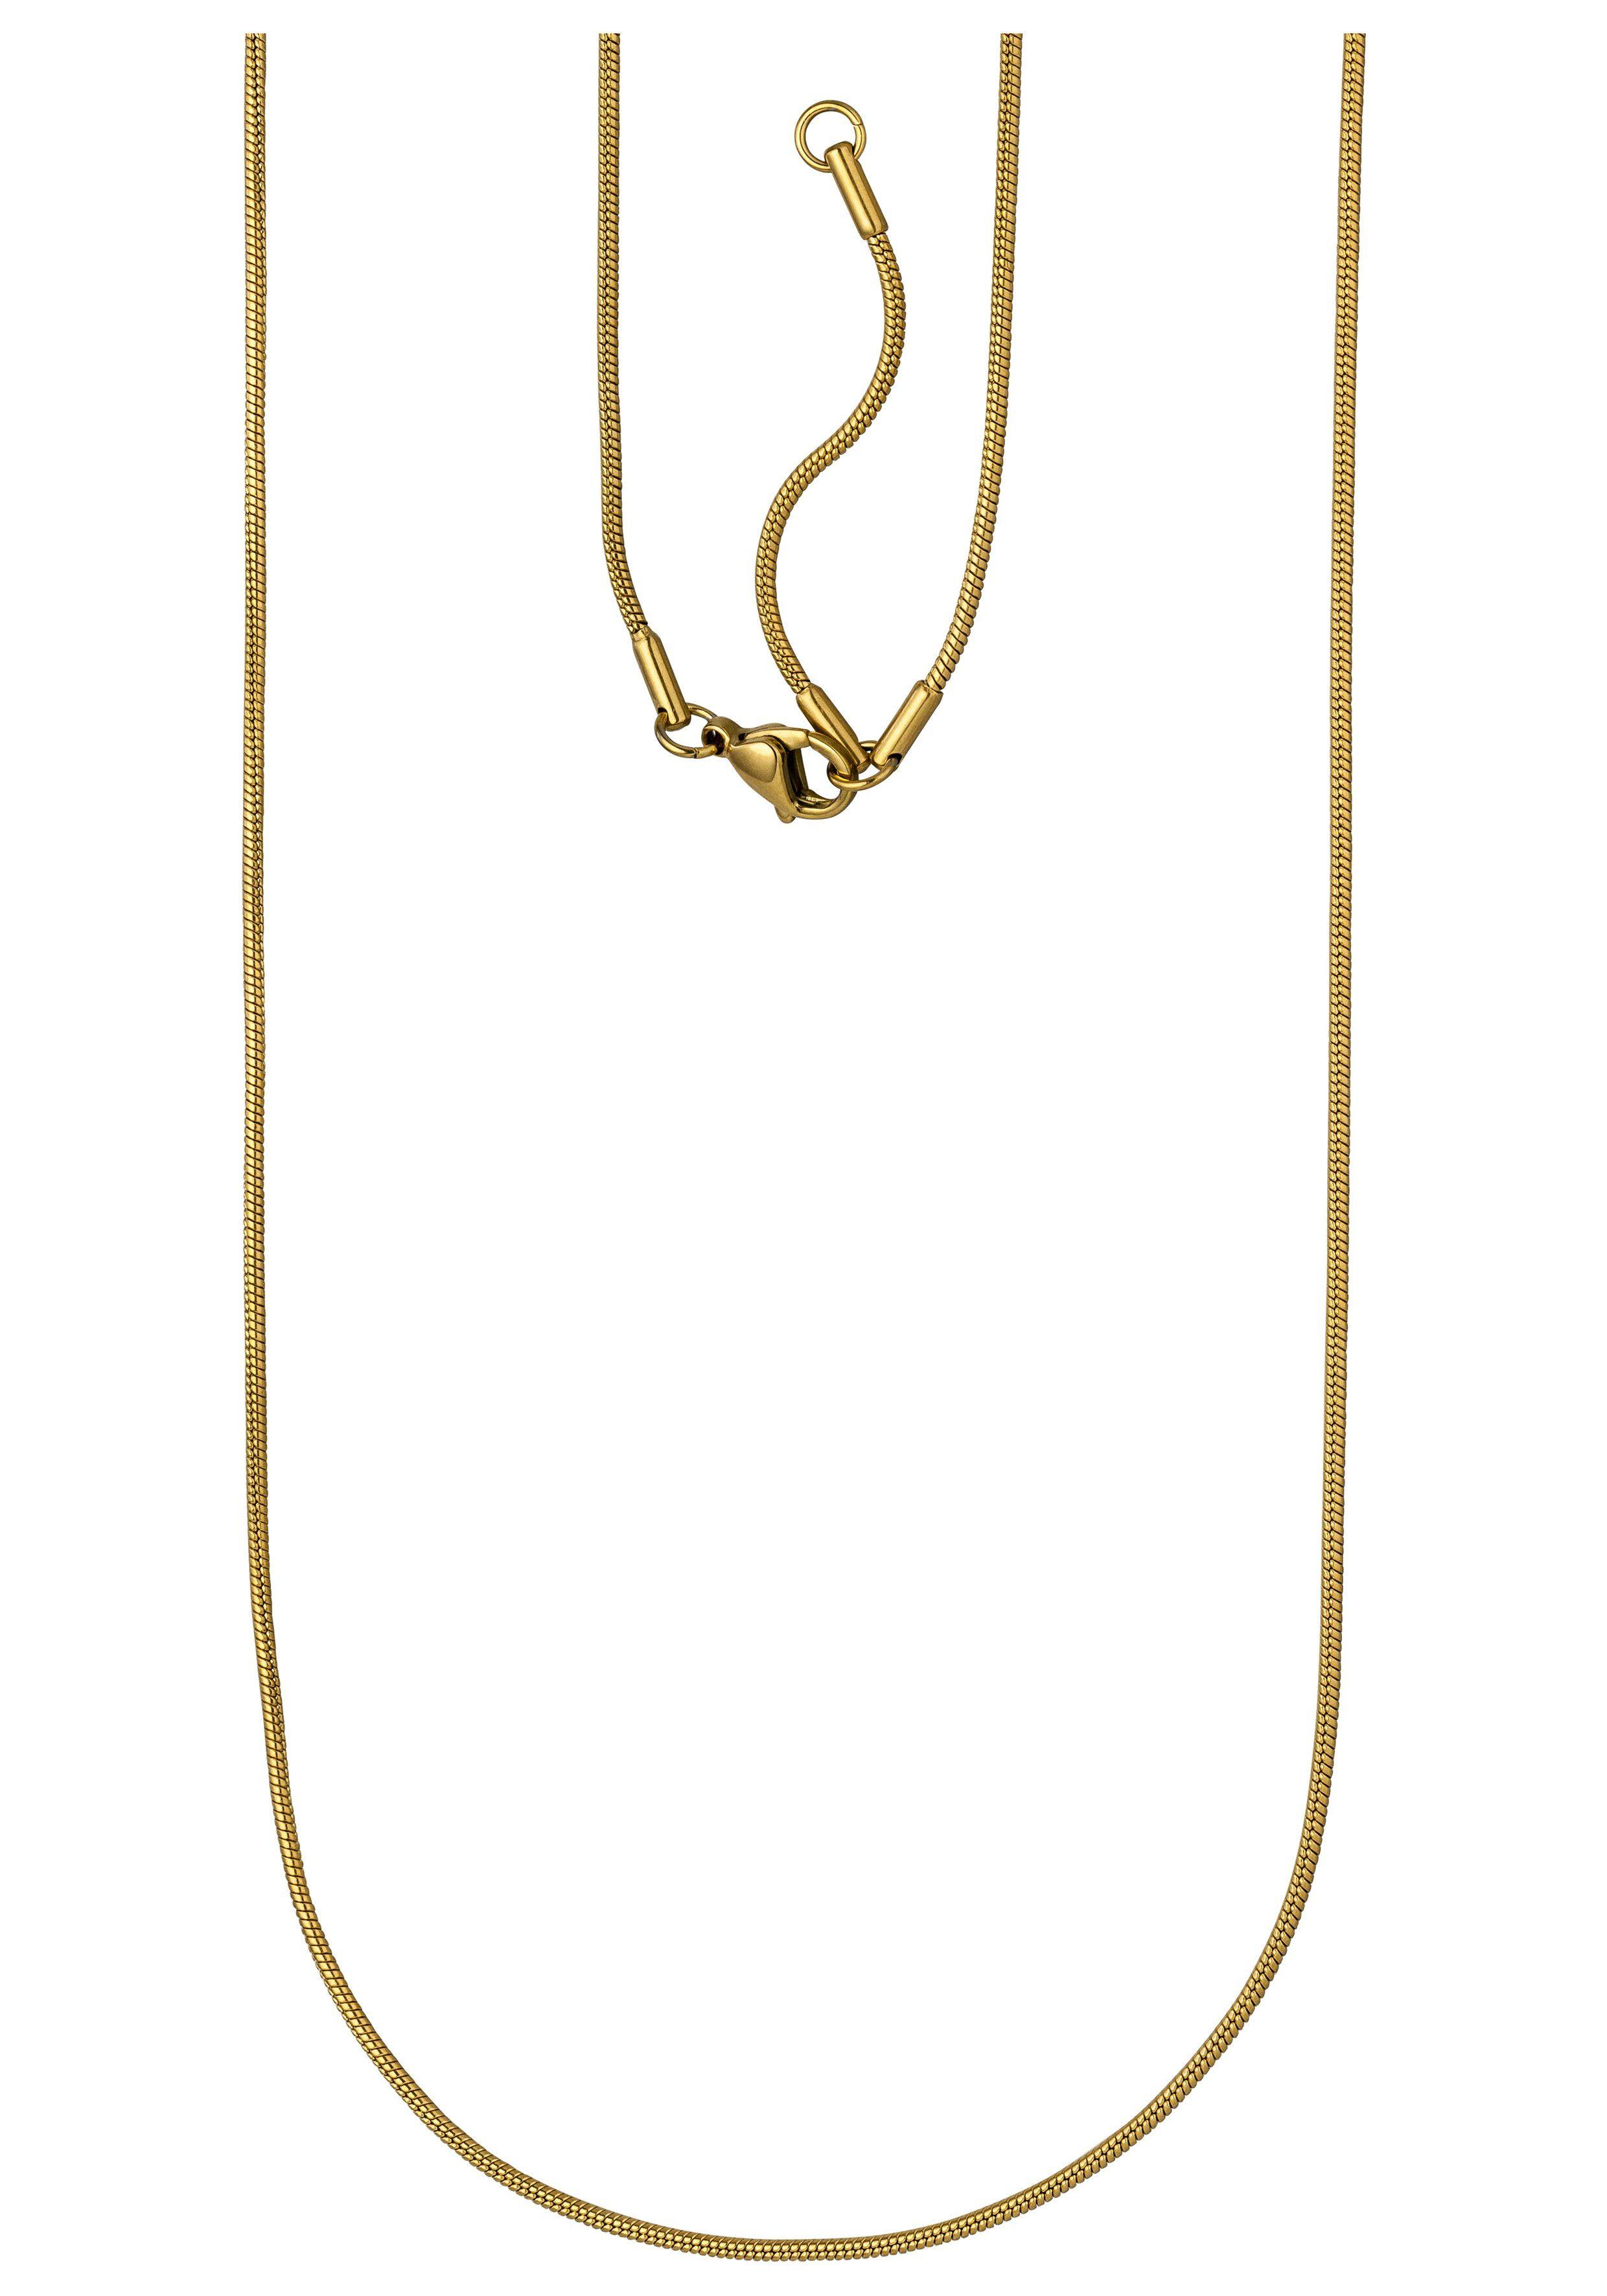 JOBO Edelstahlkette, Schlangenkette Edelstahl 80 cm 1,5 mm online kaufen | OTTO